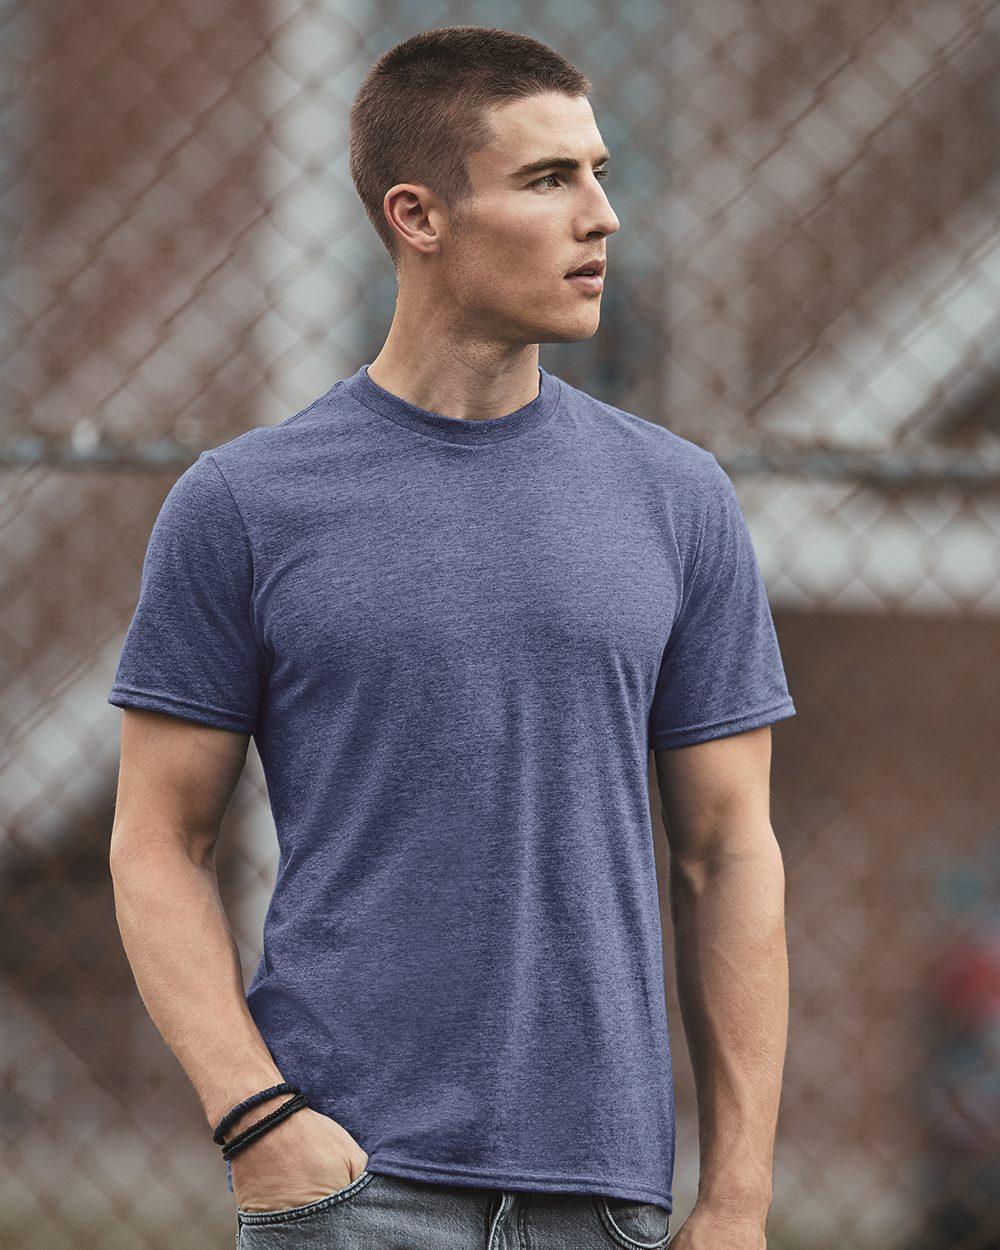 0344ab21 Anvil 980 - Lightweight Fashion Short Sleeve T-Shirt - Friendly ...